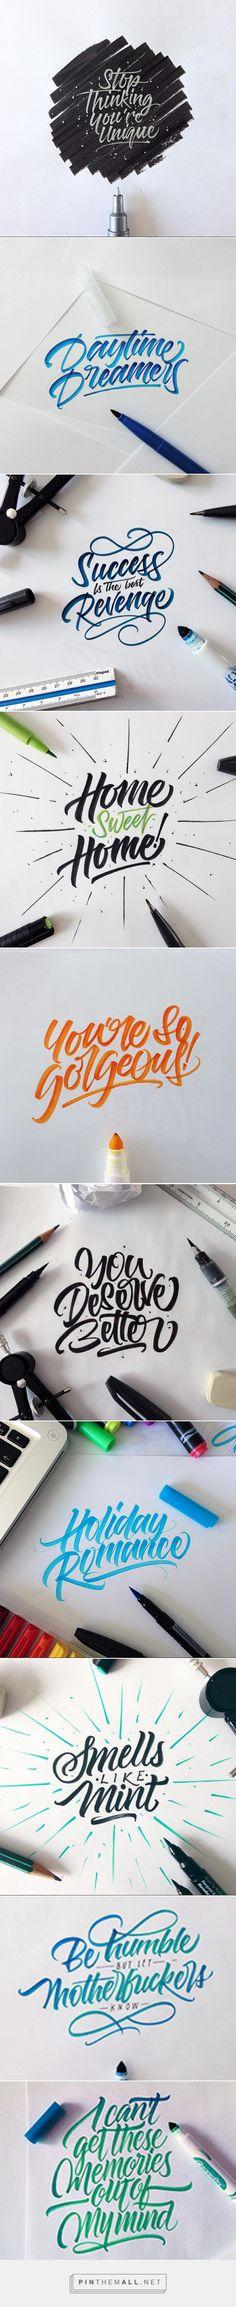 Crayola & Brushpen Lettering /// - created via http://pinthemall.net